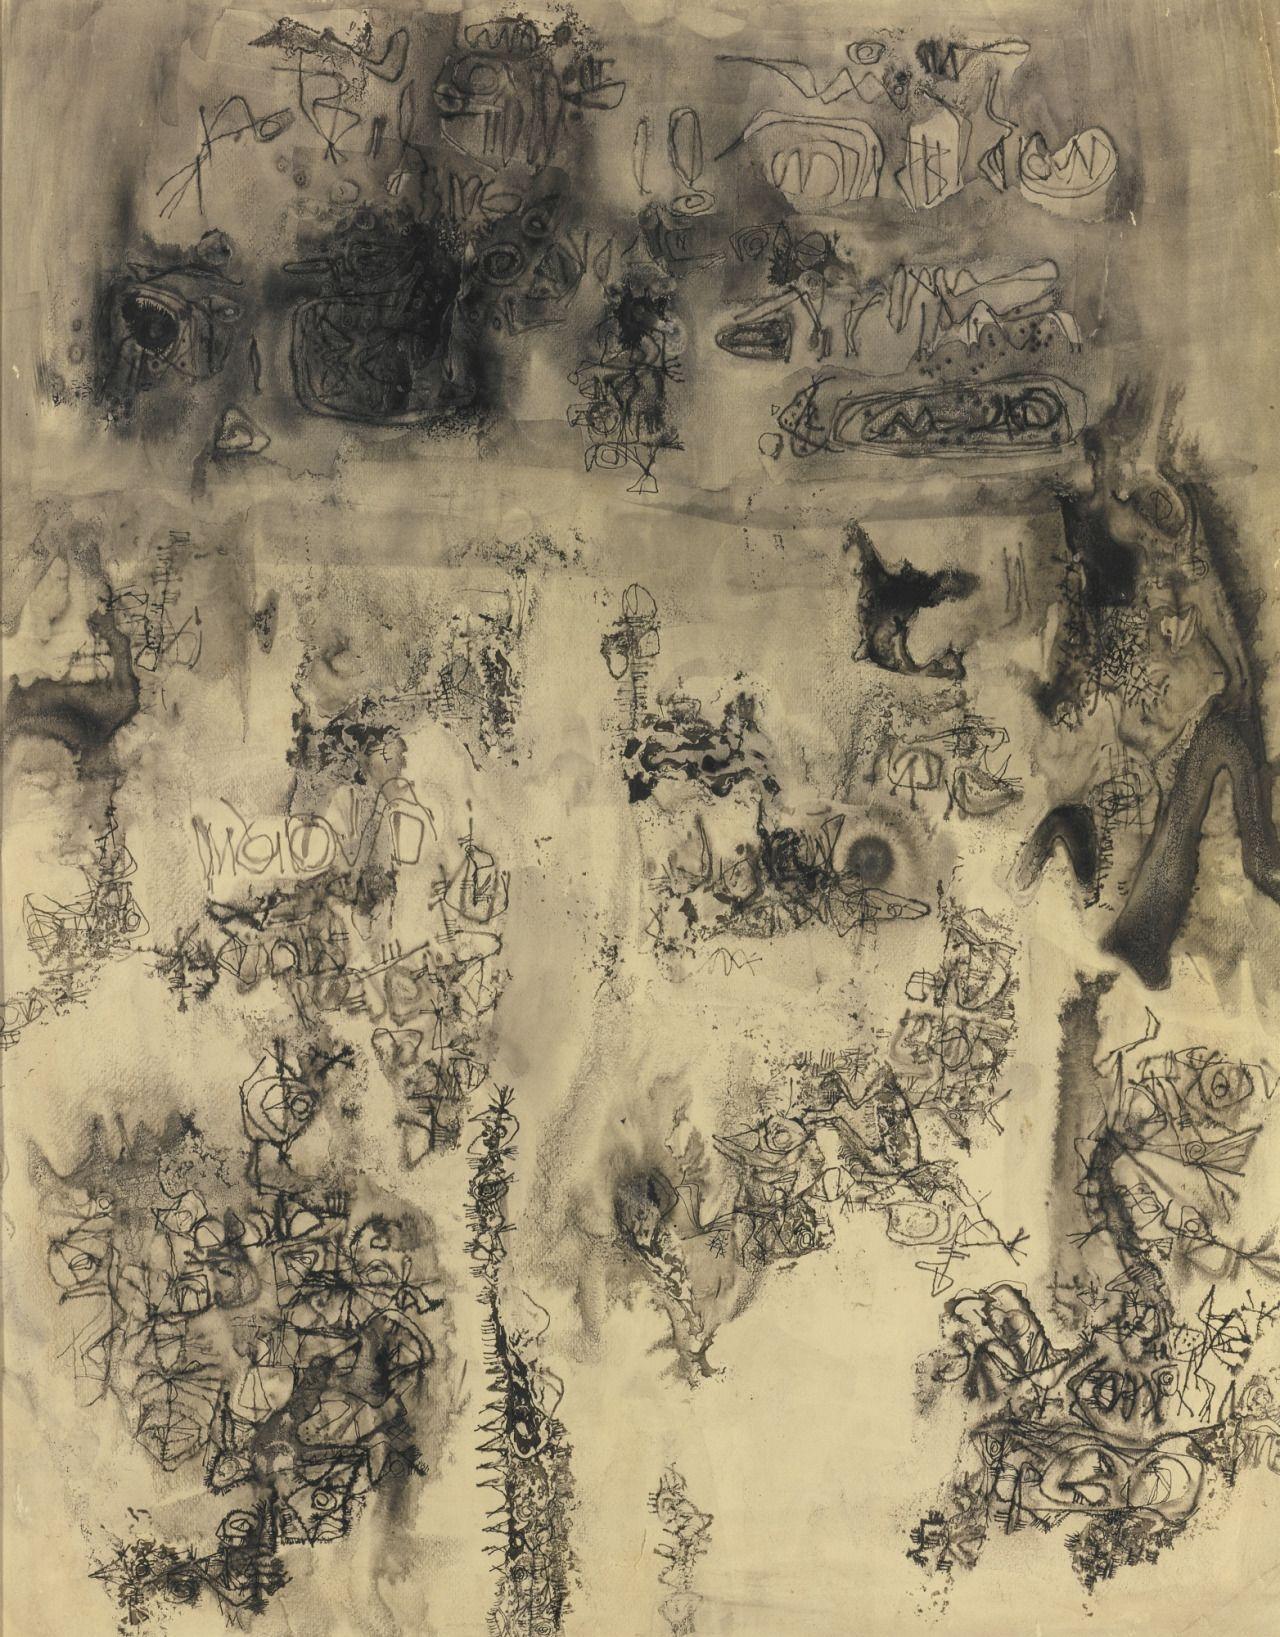 Ambadas Khobragade (Indian, 1922-2012), Untitled (Black). Ink and watercolour on paper, 61.6 x 48 cm.